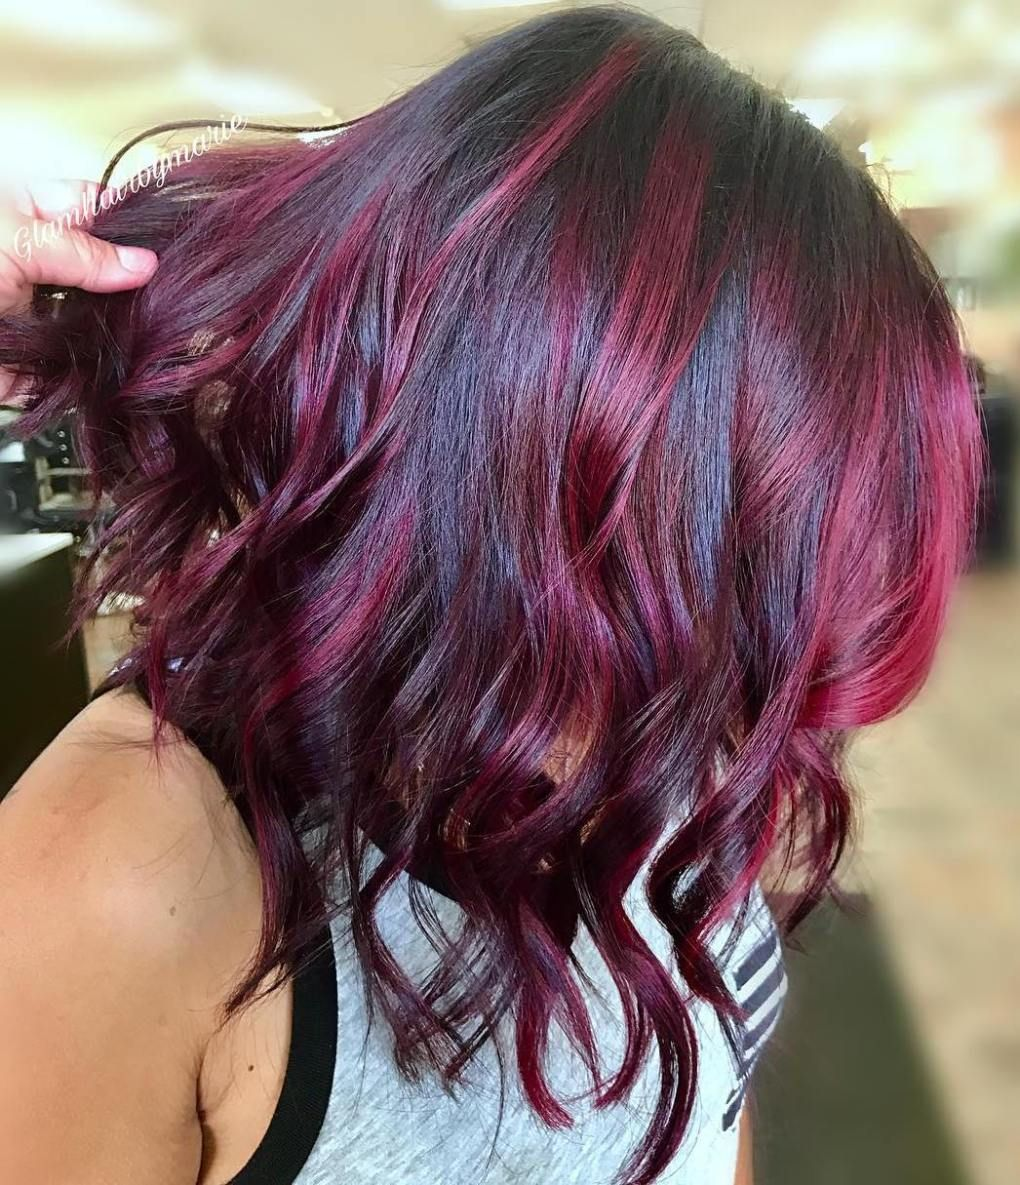 45 Shades Of Burgundy Hair Dark Burgundy Maroon Burgundy With Red Purple And Brown Highlights Magenta Hair Hair Highlights Red Blonde Hair